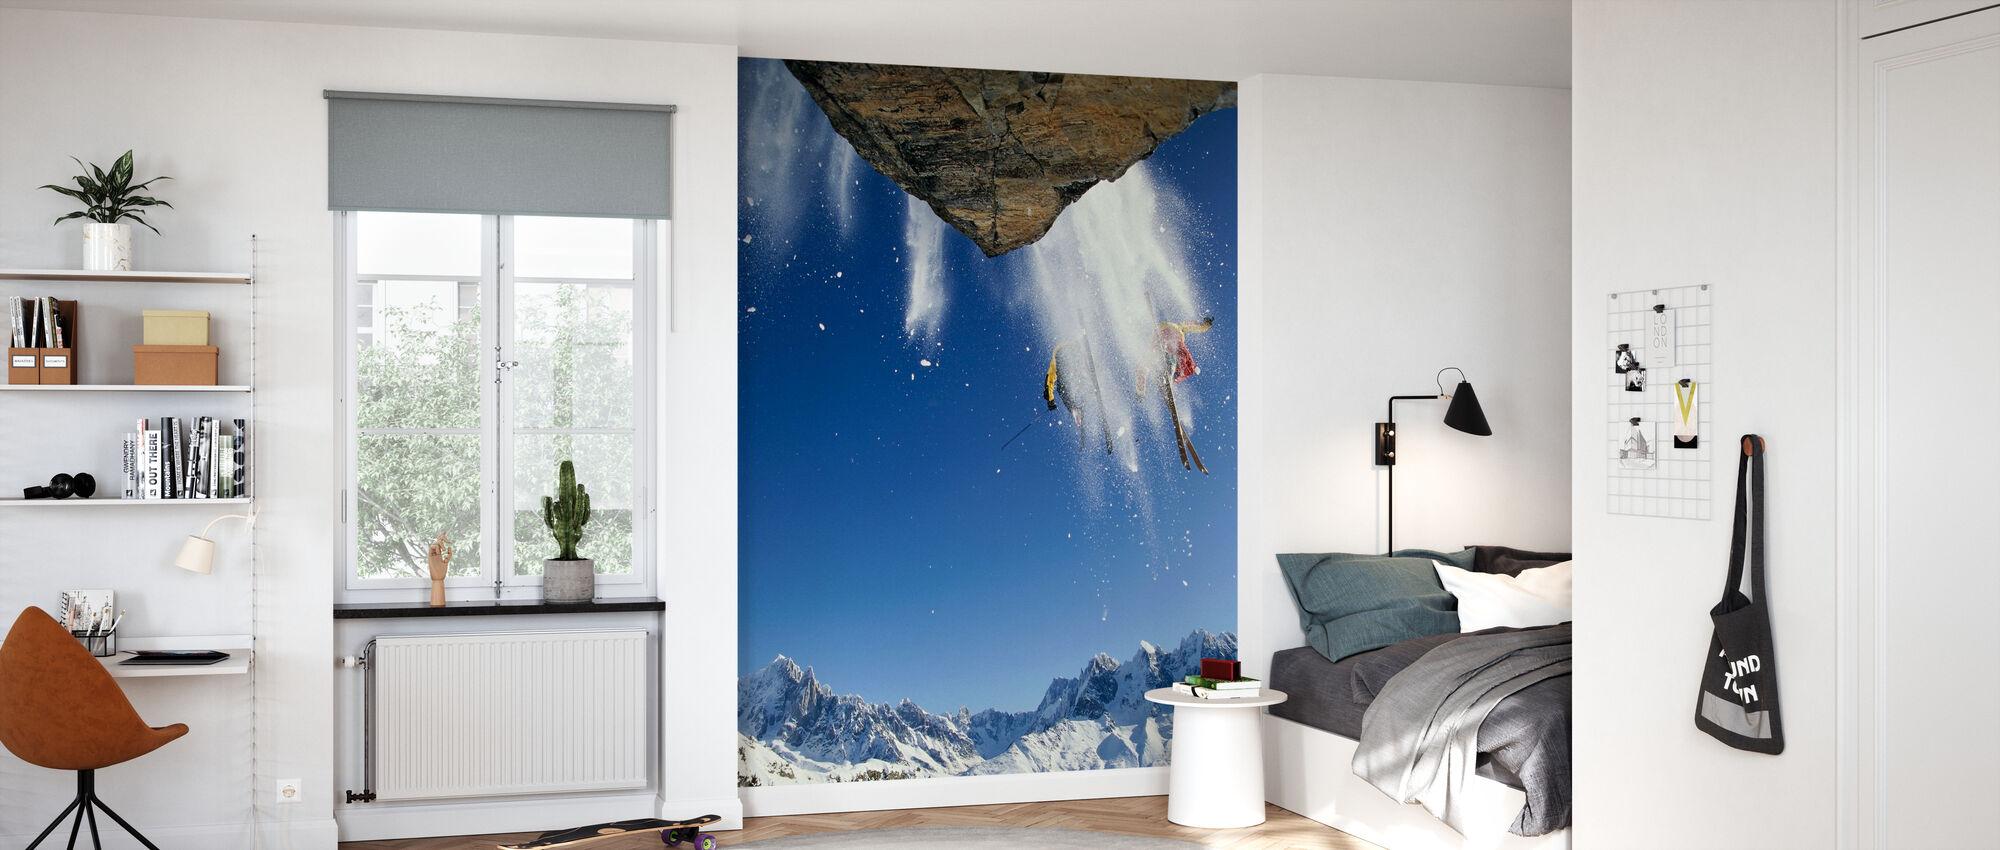 Off Piste Skiing at Mont Blanc - Wallpaper - Kids Room